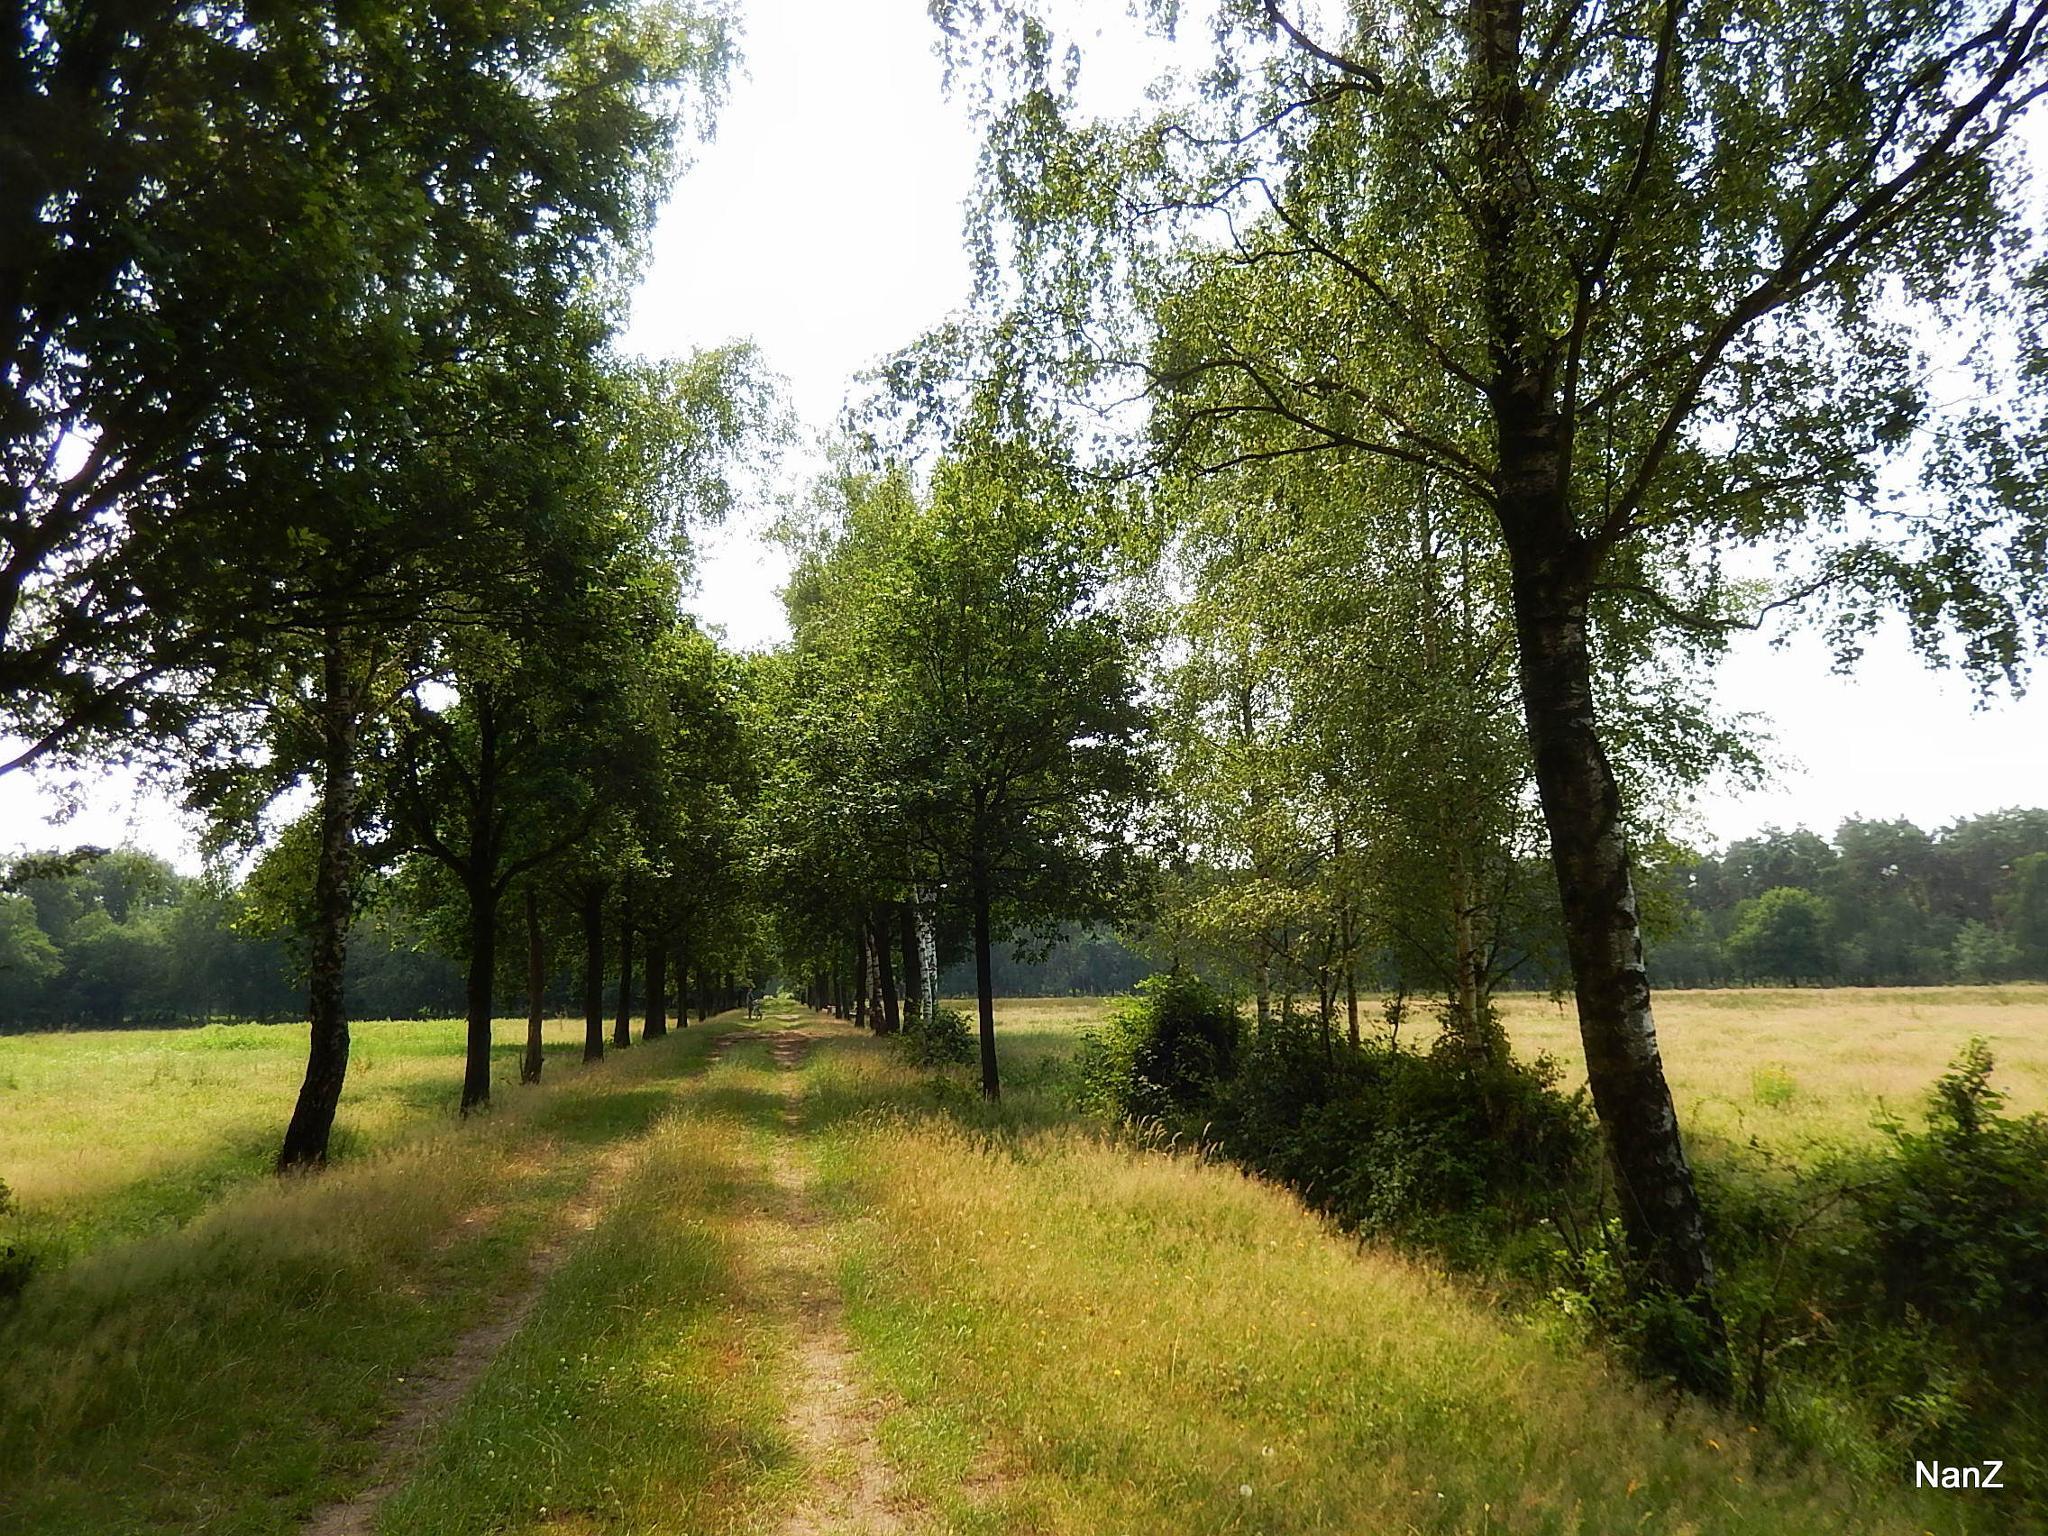 Brabant by Nancy Zuiderwijk